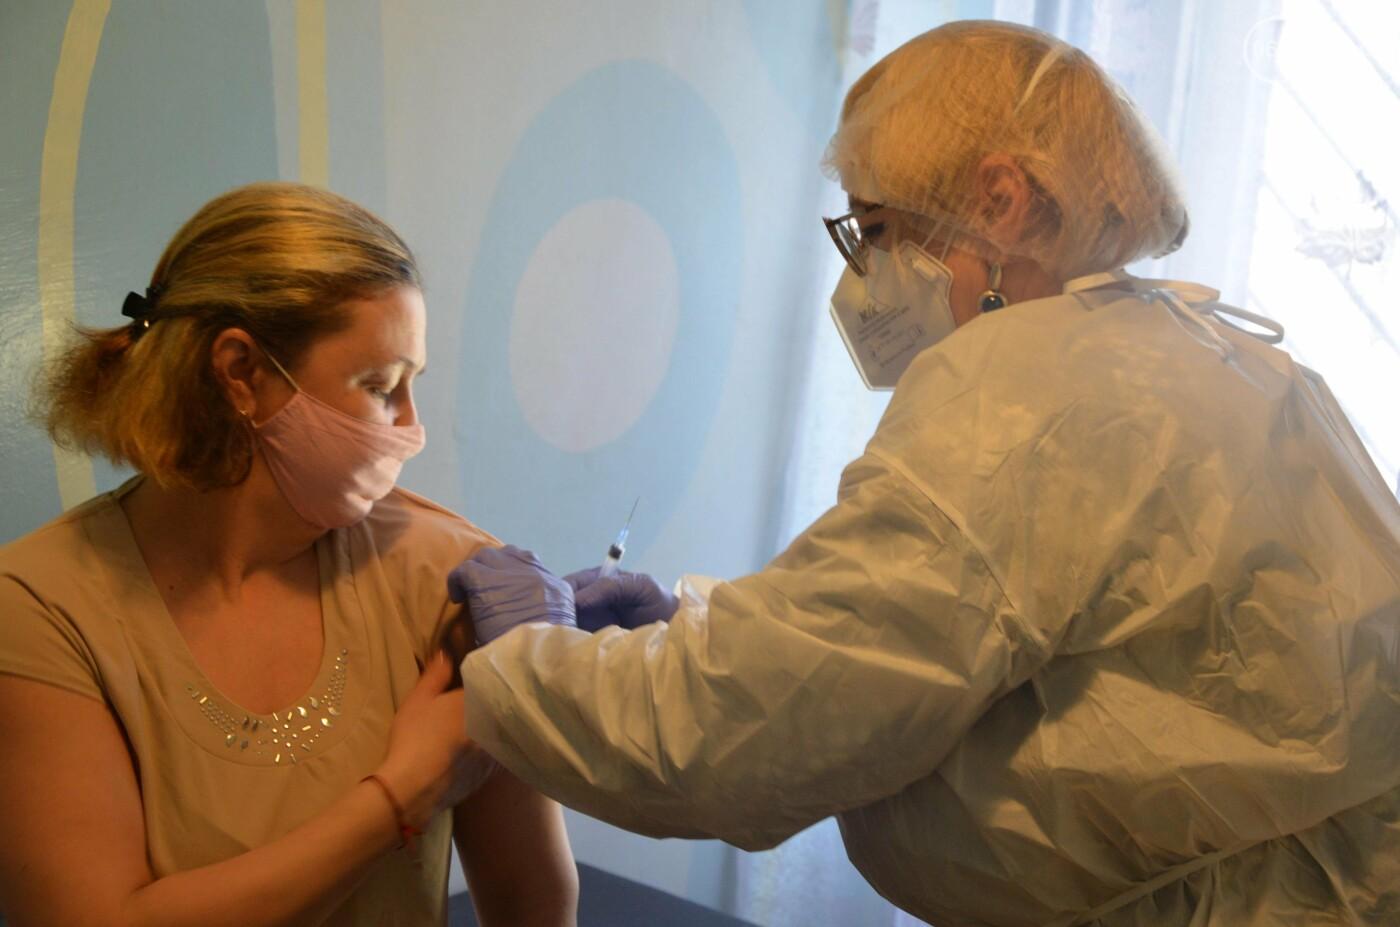 В Мариуполе сотрудники детского сада привились от коронавируса, - ФОТО, фото-4